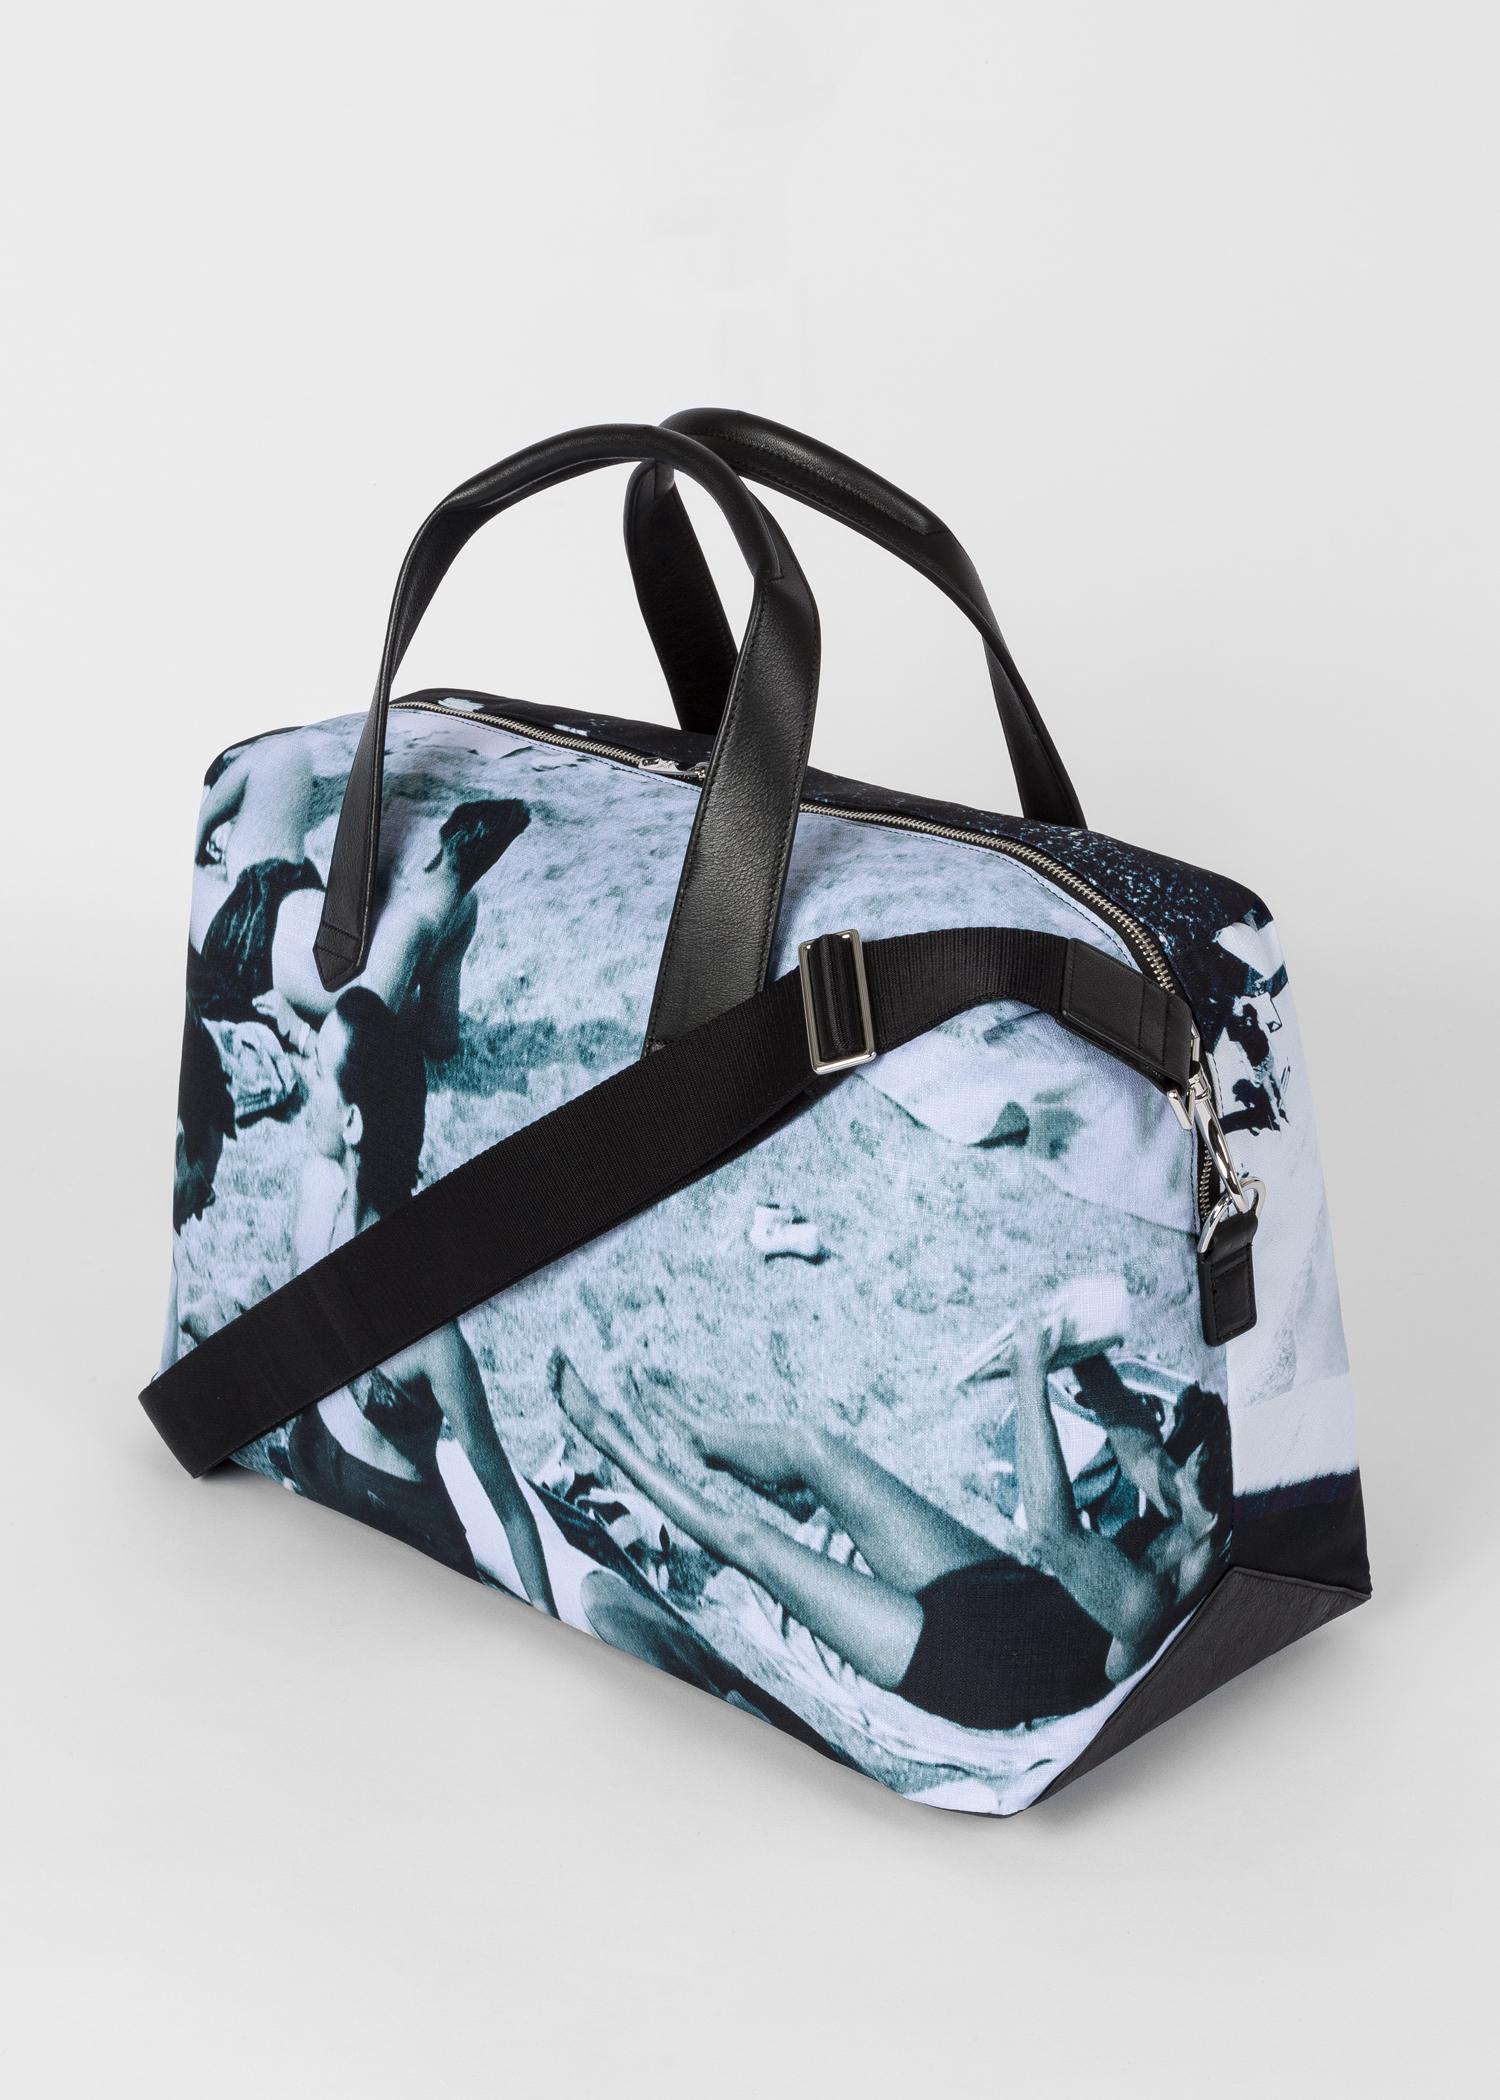 70dfe590a Strap detail - Men's Blue 'Paul's Photo' Print Canvas Weekend Bag Paul Smith